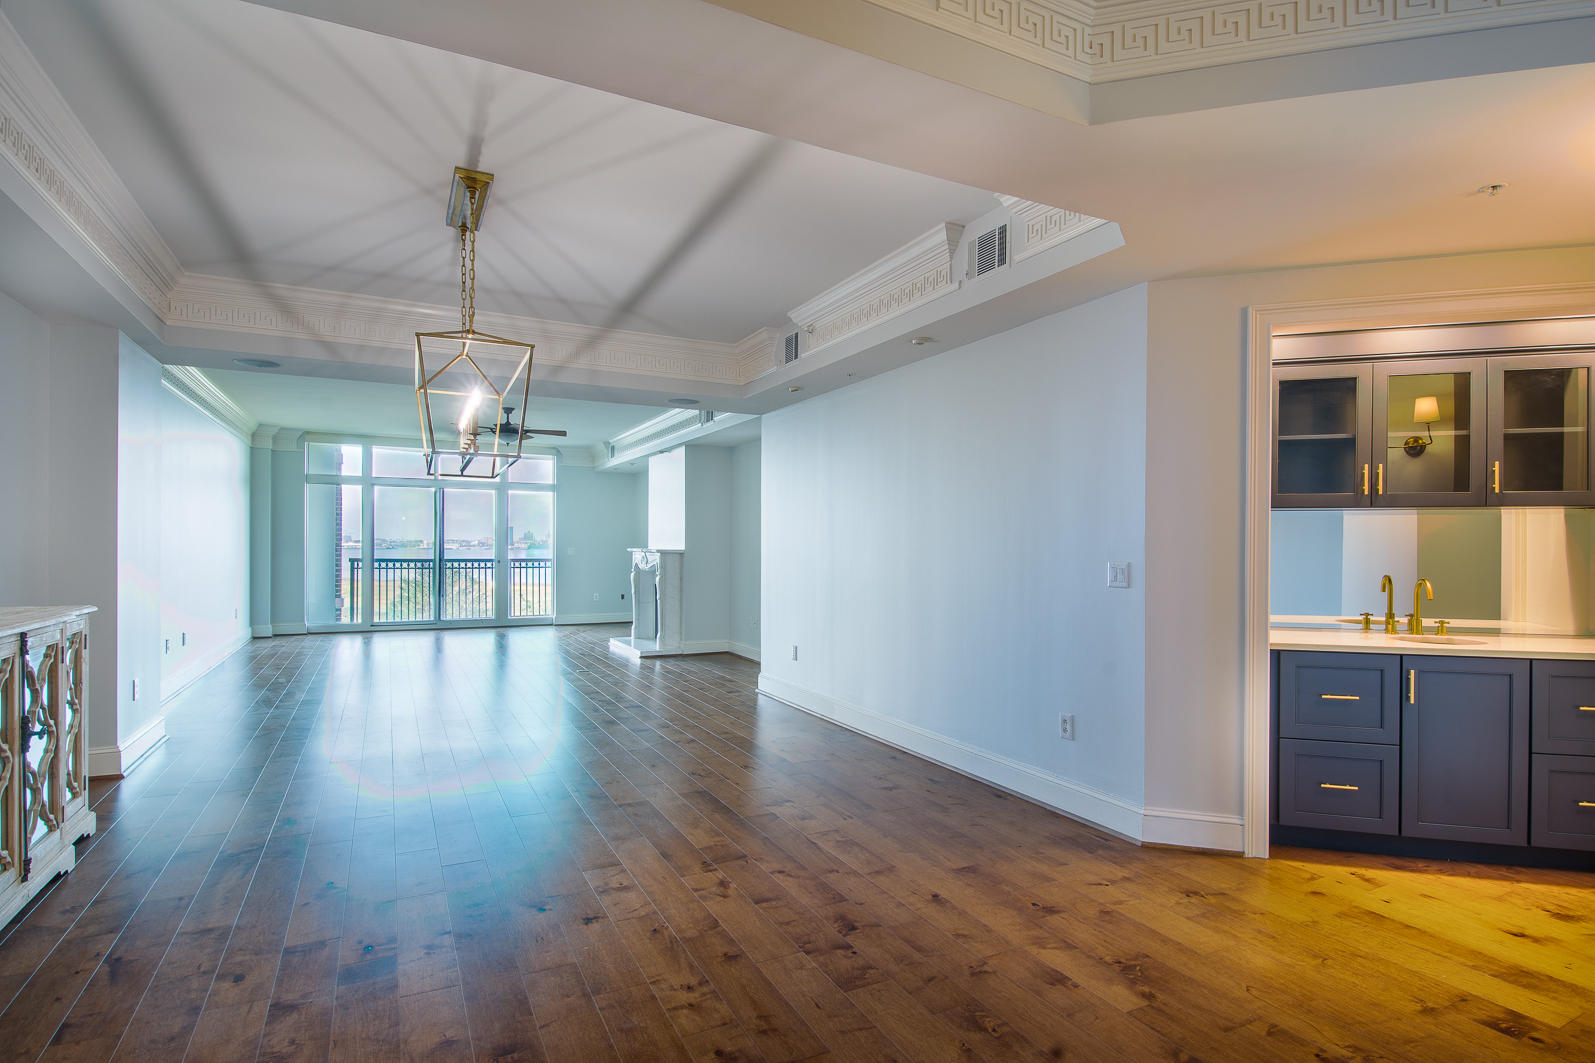 Renaissance On Chas Harbor Homes For Sale - 144 Plaza, Mount Pleasant, SC - 7